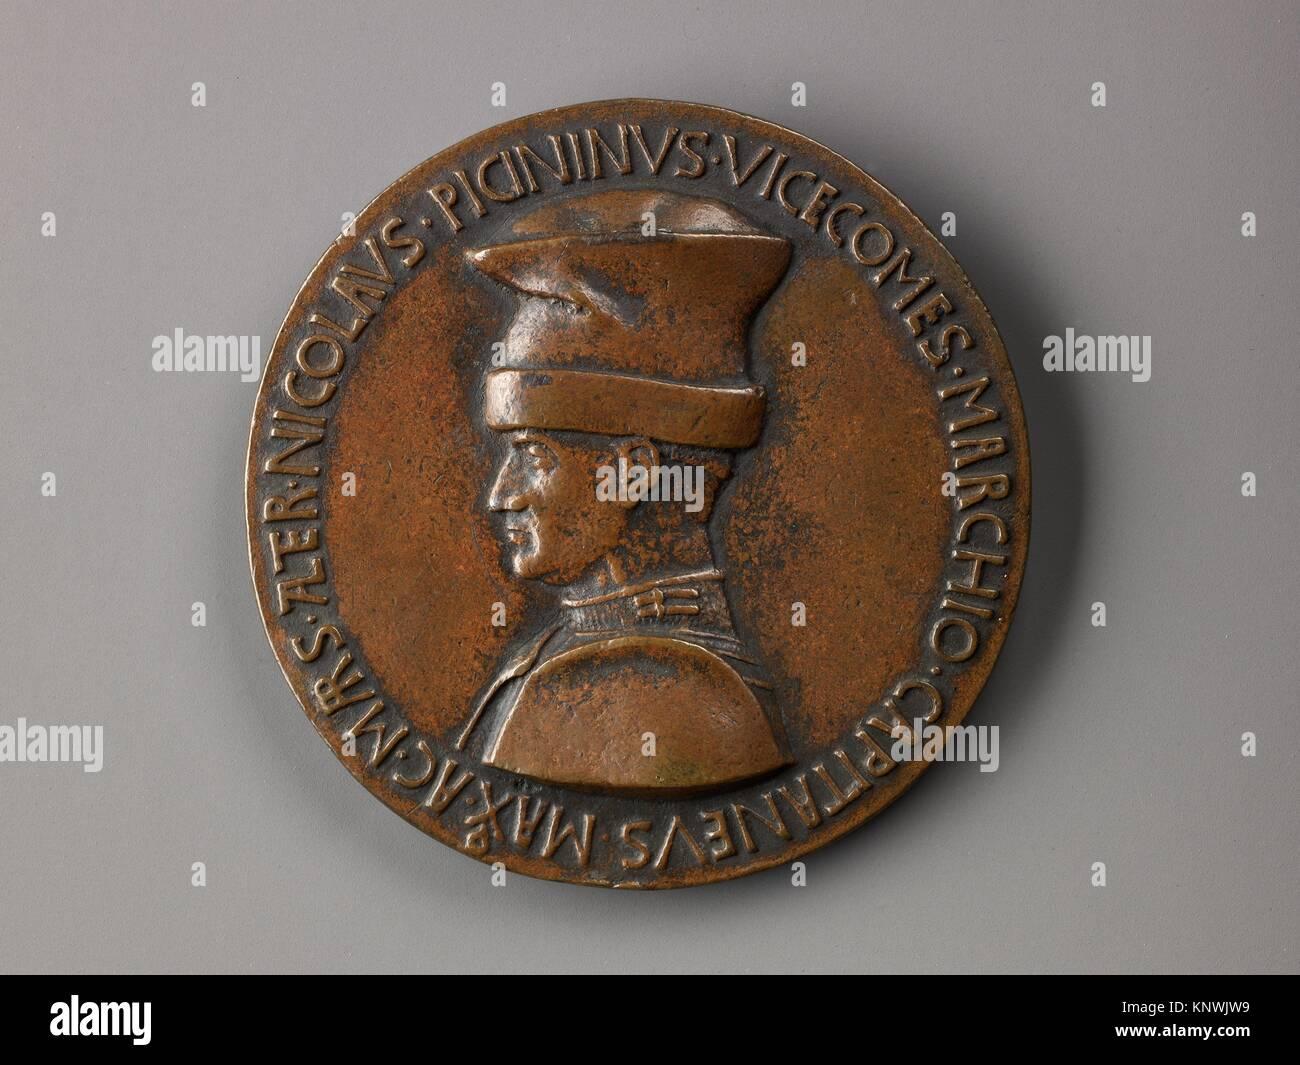 Medal. Artist: Pisanello (Antonio Pisano) (Italian, Pisa or Verona by 1395-1455); Date: model 1440-41 (possibly Stock Photo